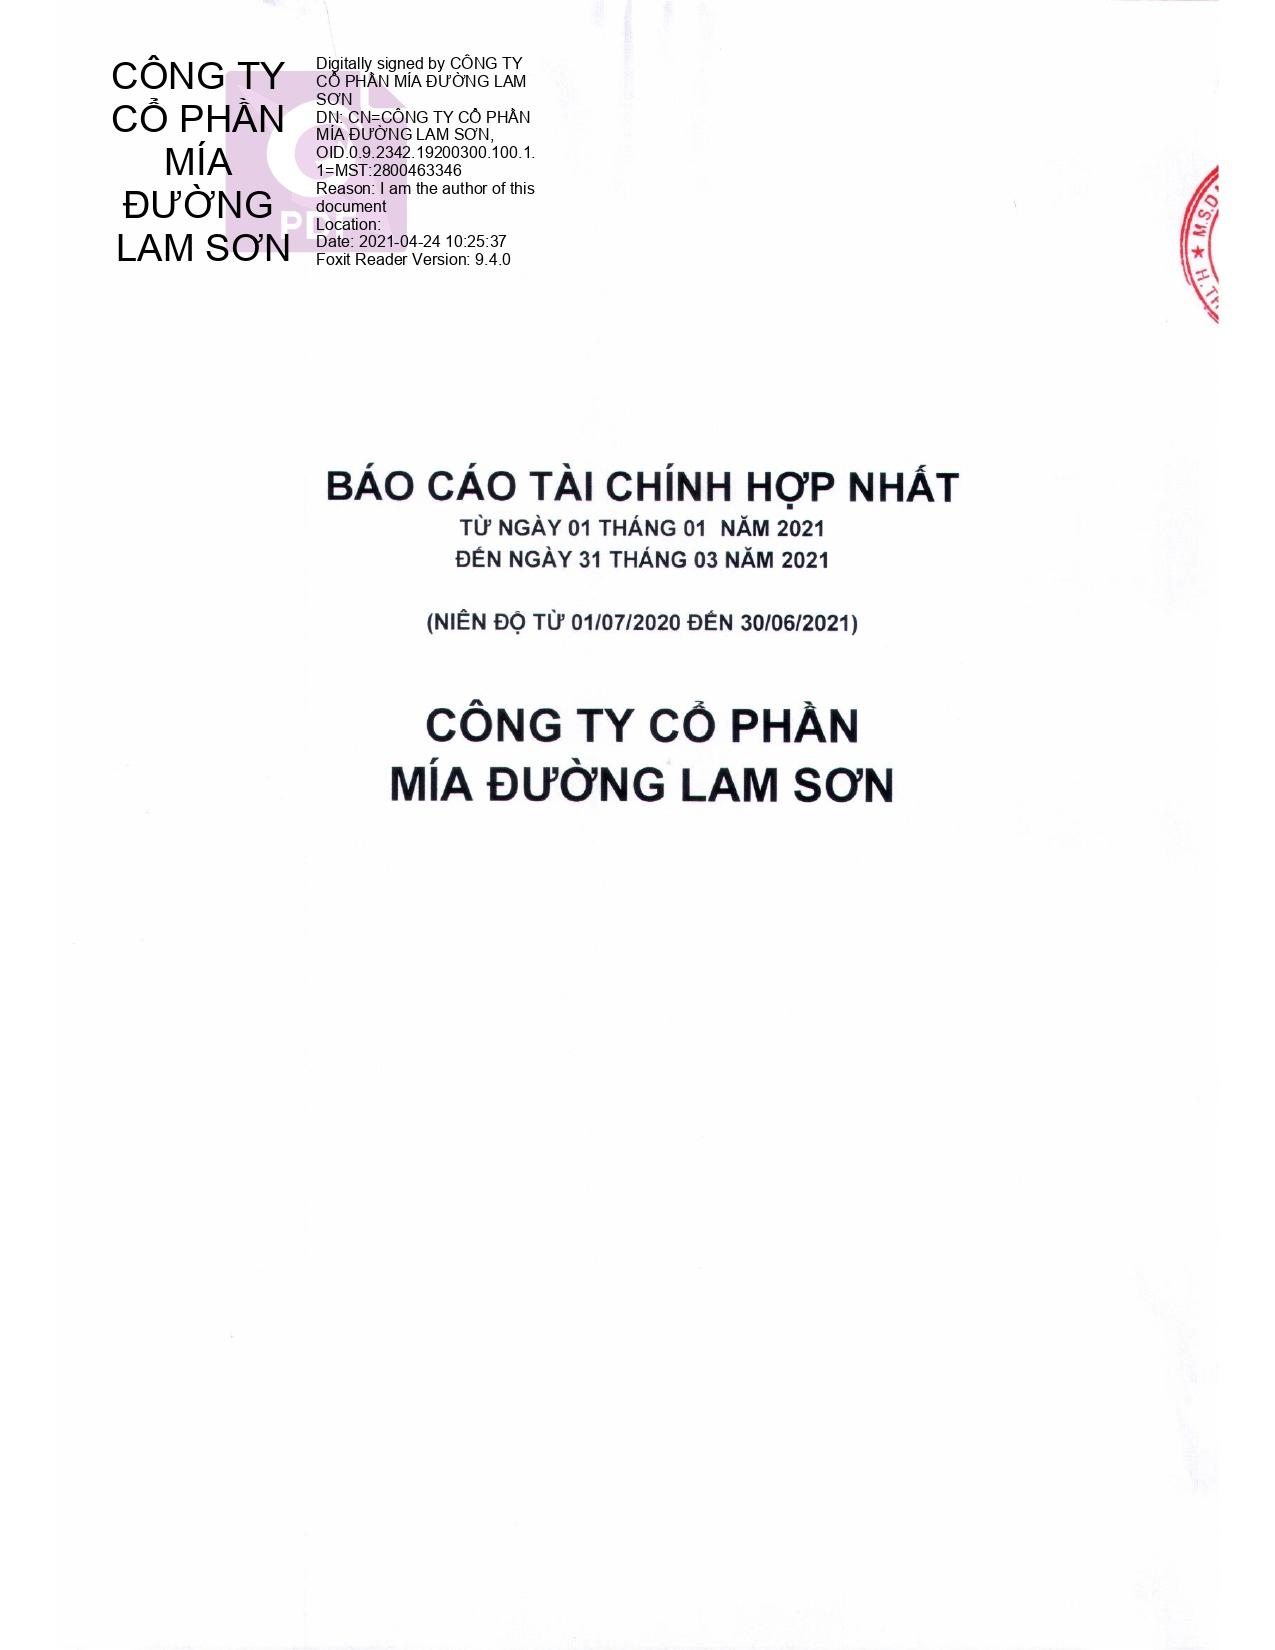 BC - HOP NHAT (1)_page-0001